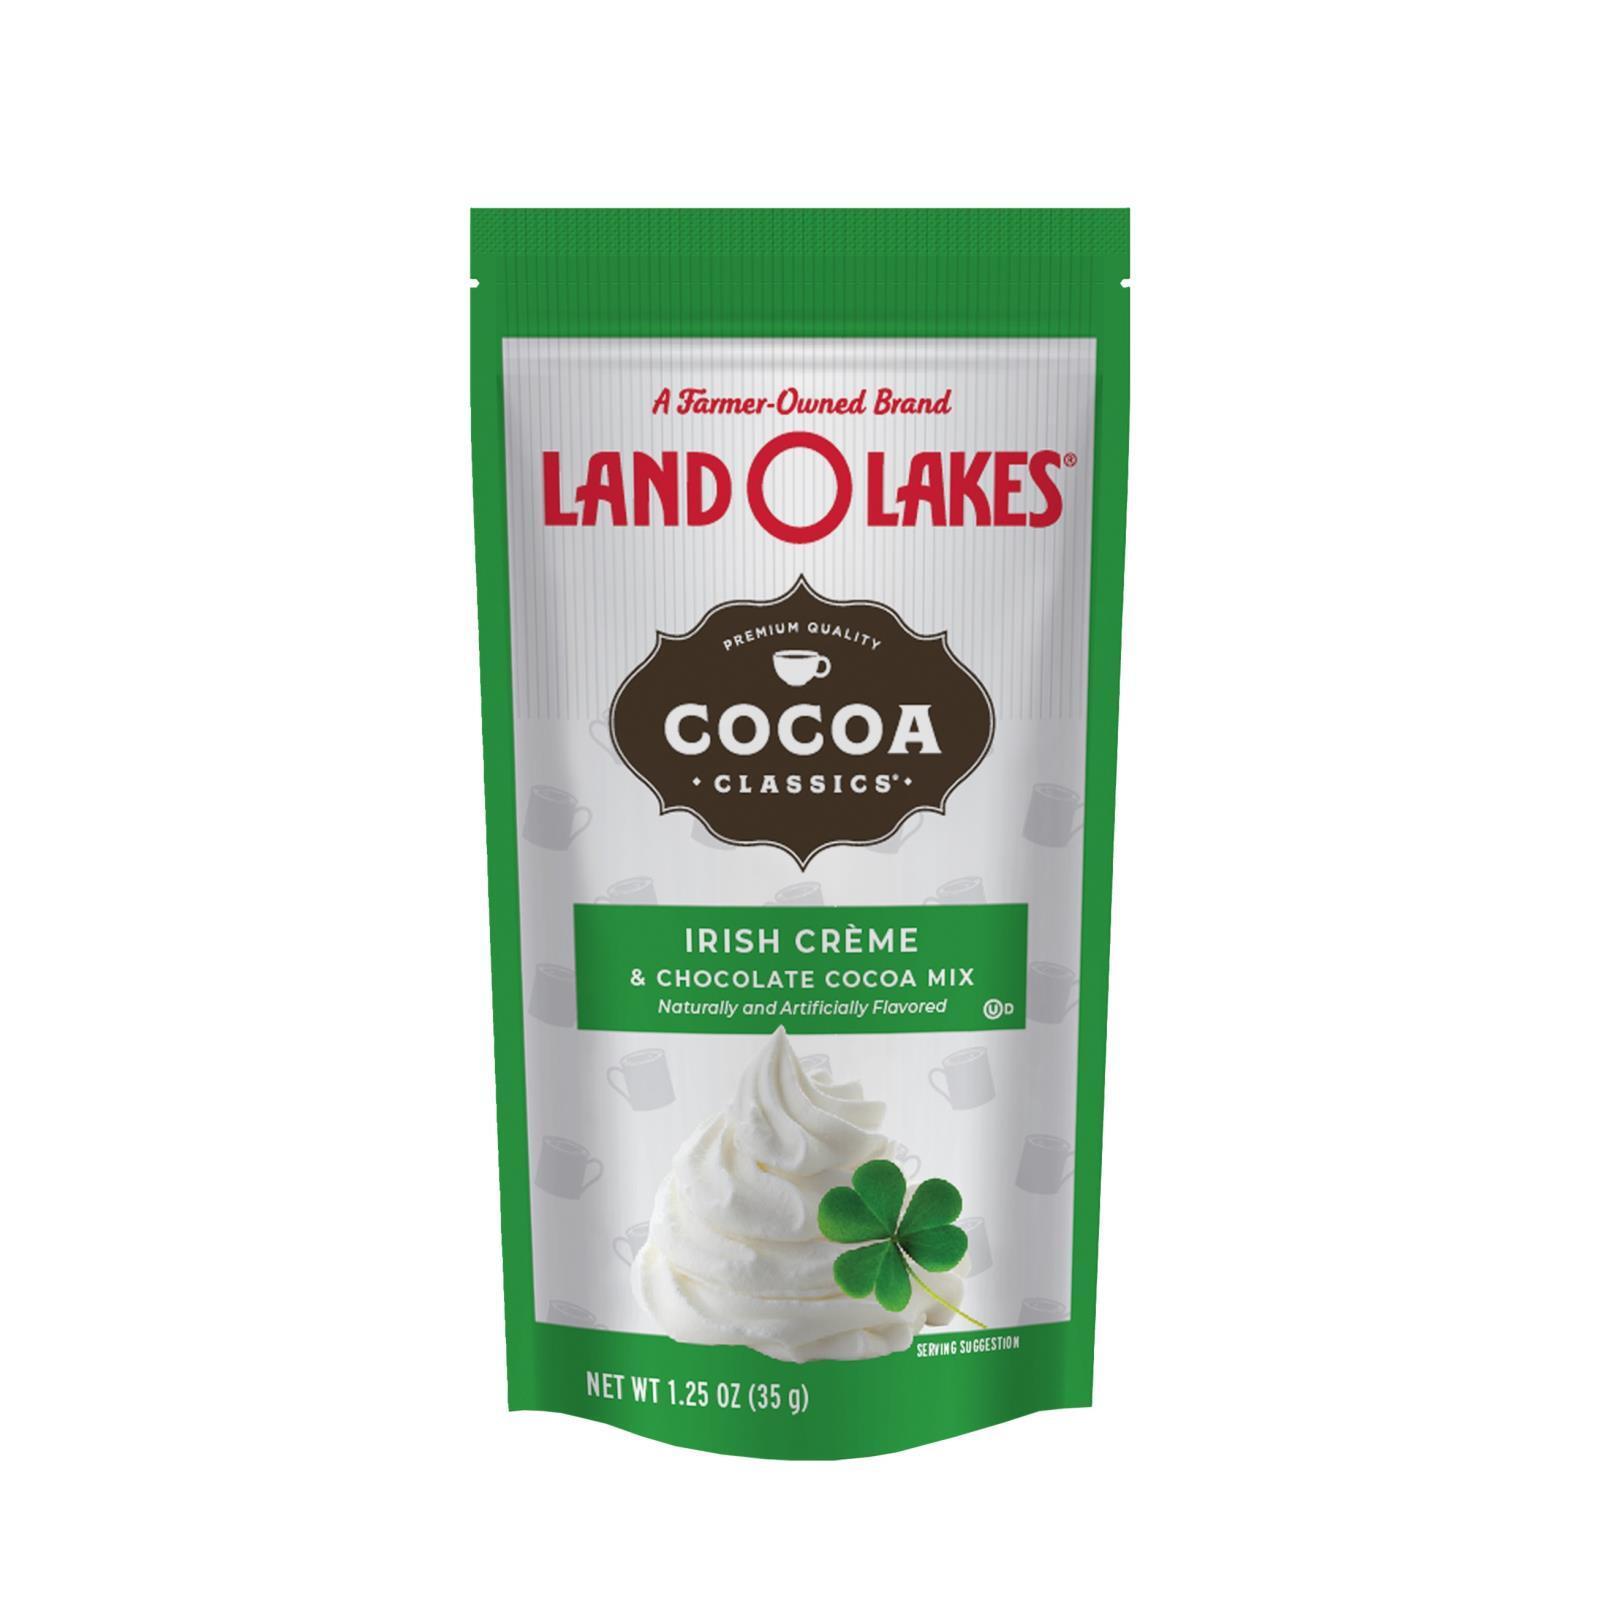 Land O Lakes Cocoa Classic Mix - Irish Creme and Chocolate - 1.25 oz - Case of 12